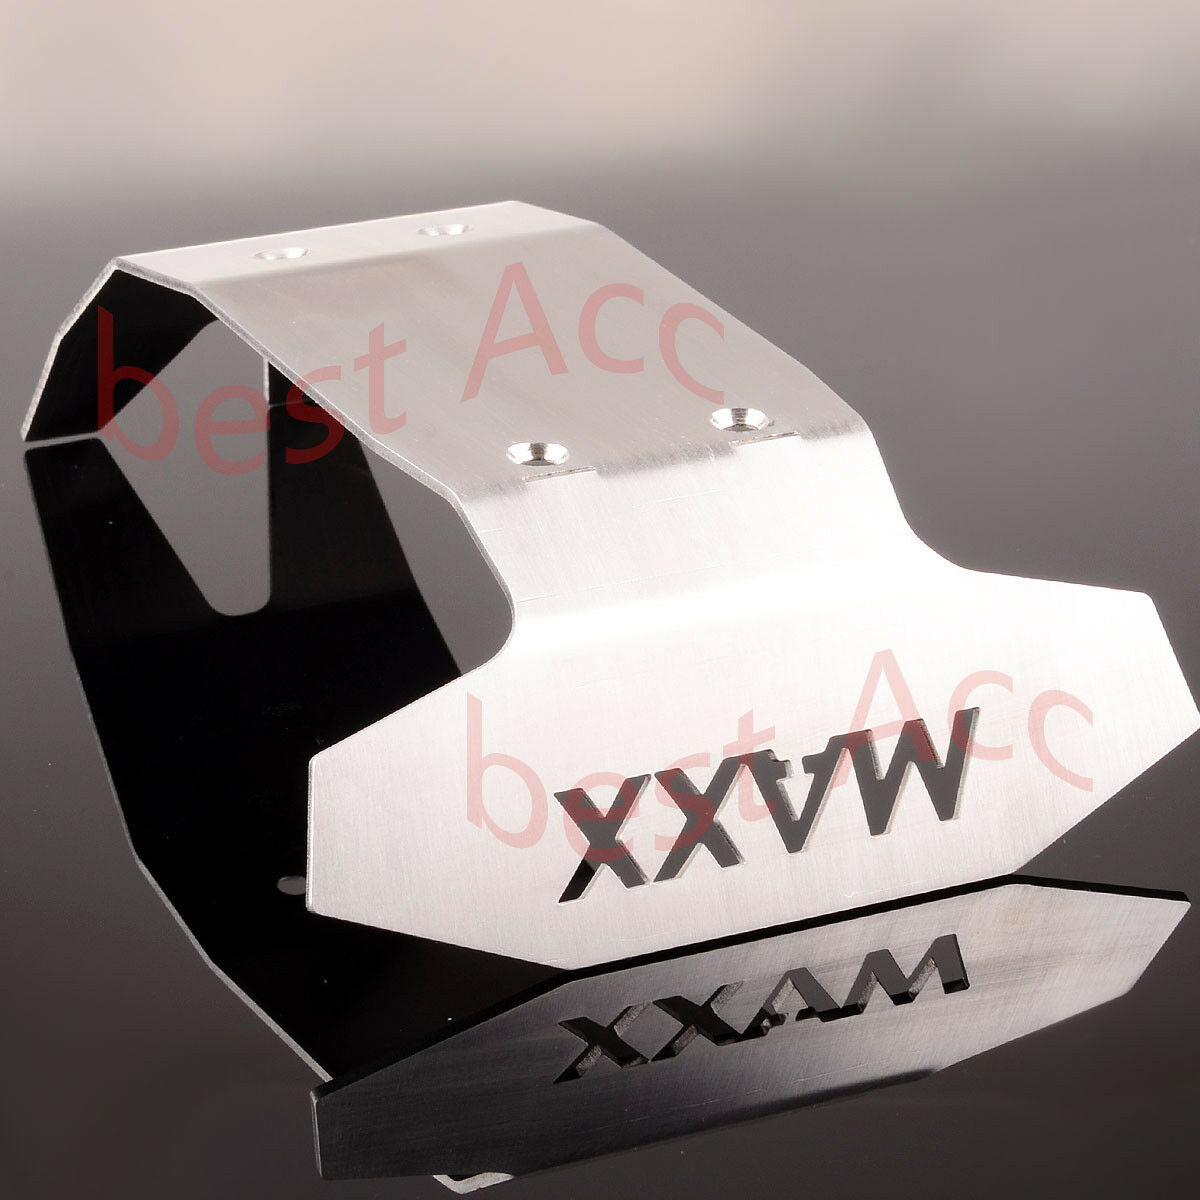 For RC Stainless Steel Steel Steel Chassis Armor davanti&Rear Skid Plate Traxxas X-Maxx XMAXX 5a3b82